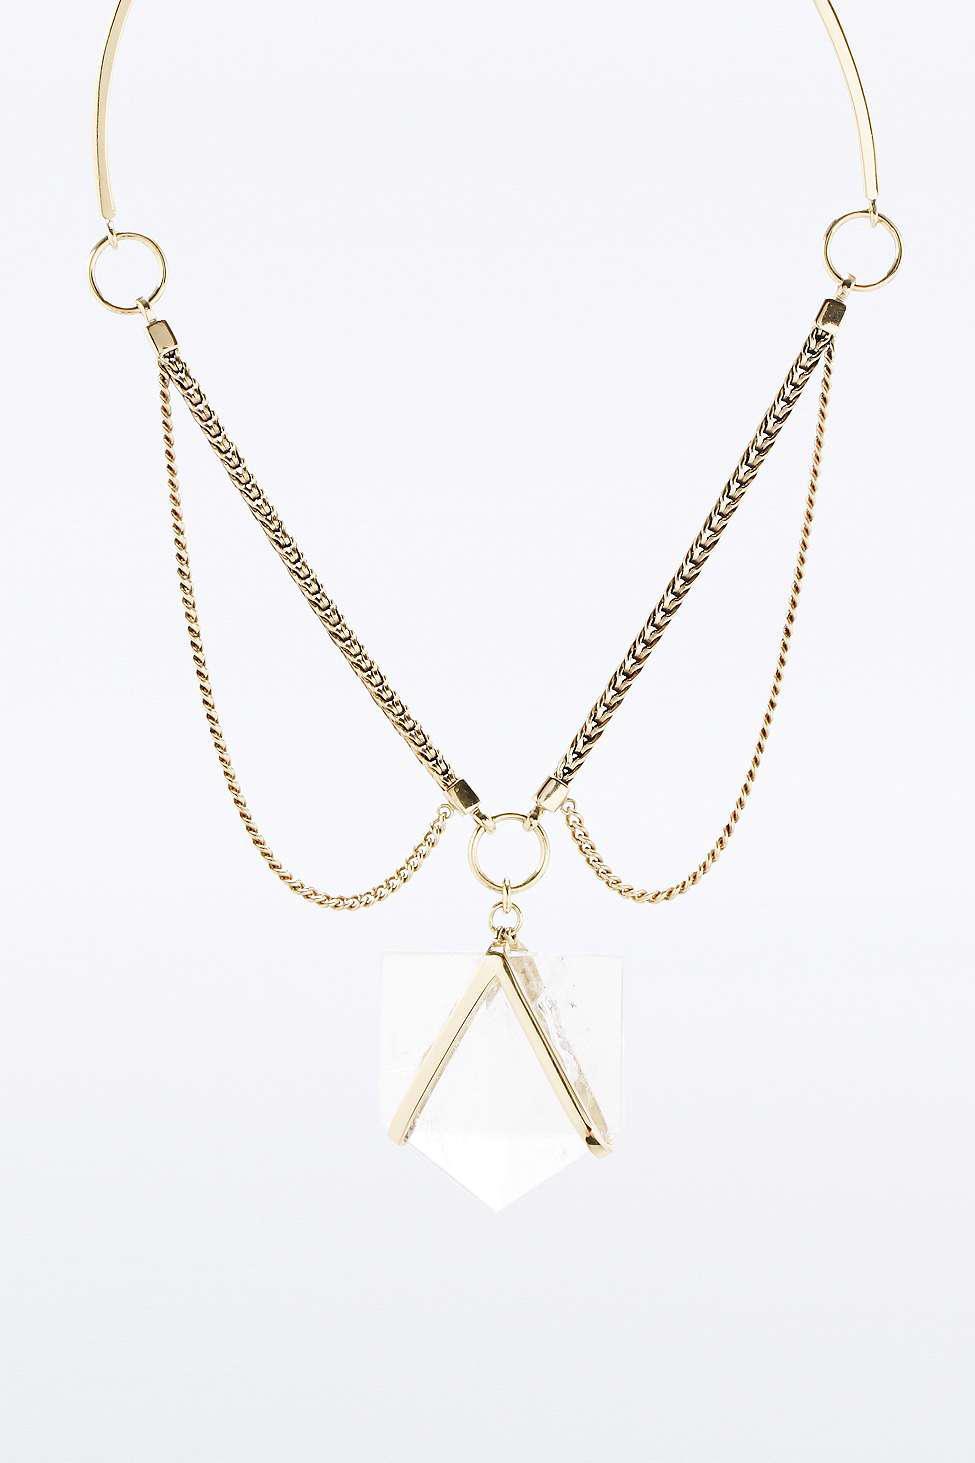 Maniamania Nova Necklace in Gold (Metallic)